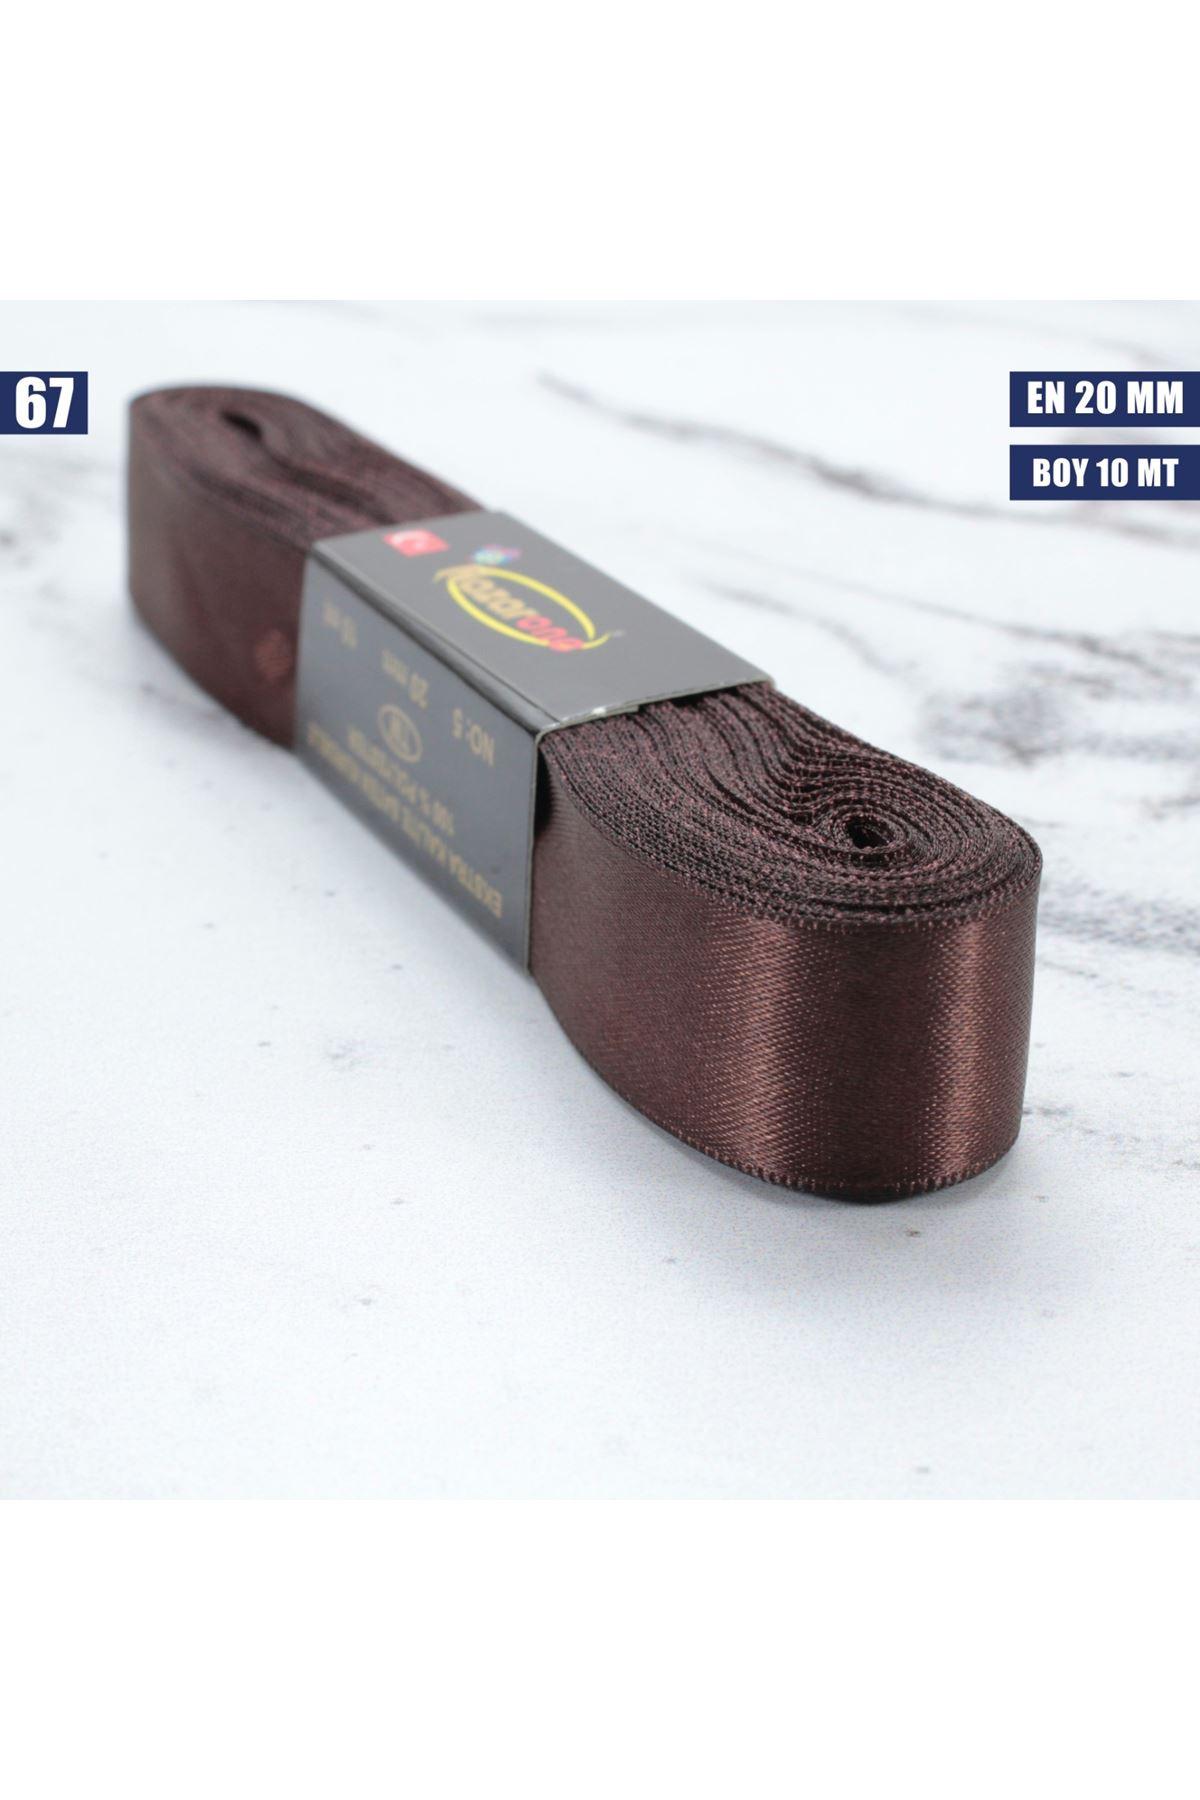 Saten Kurdele - 20 mm - 67